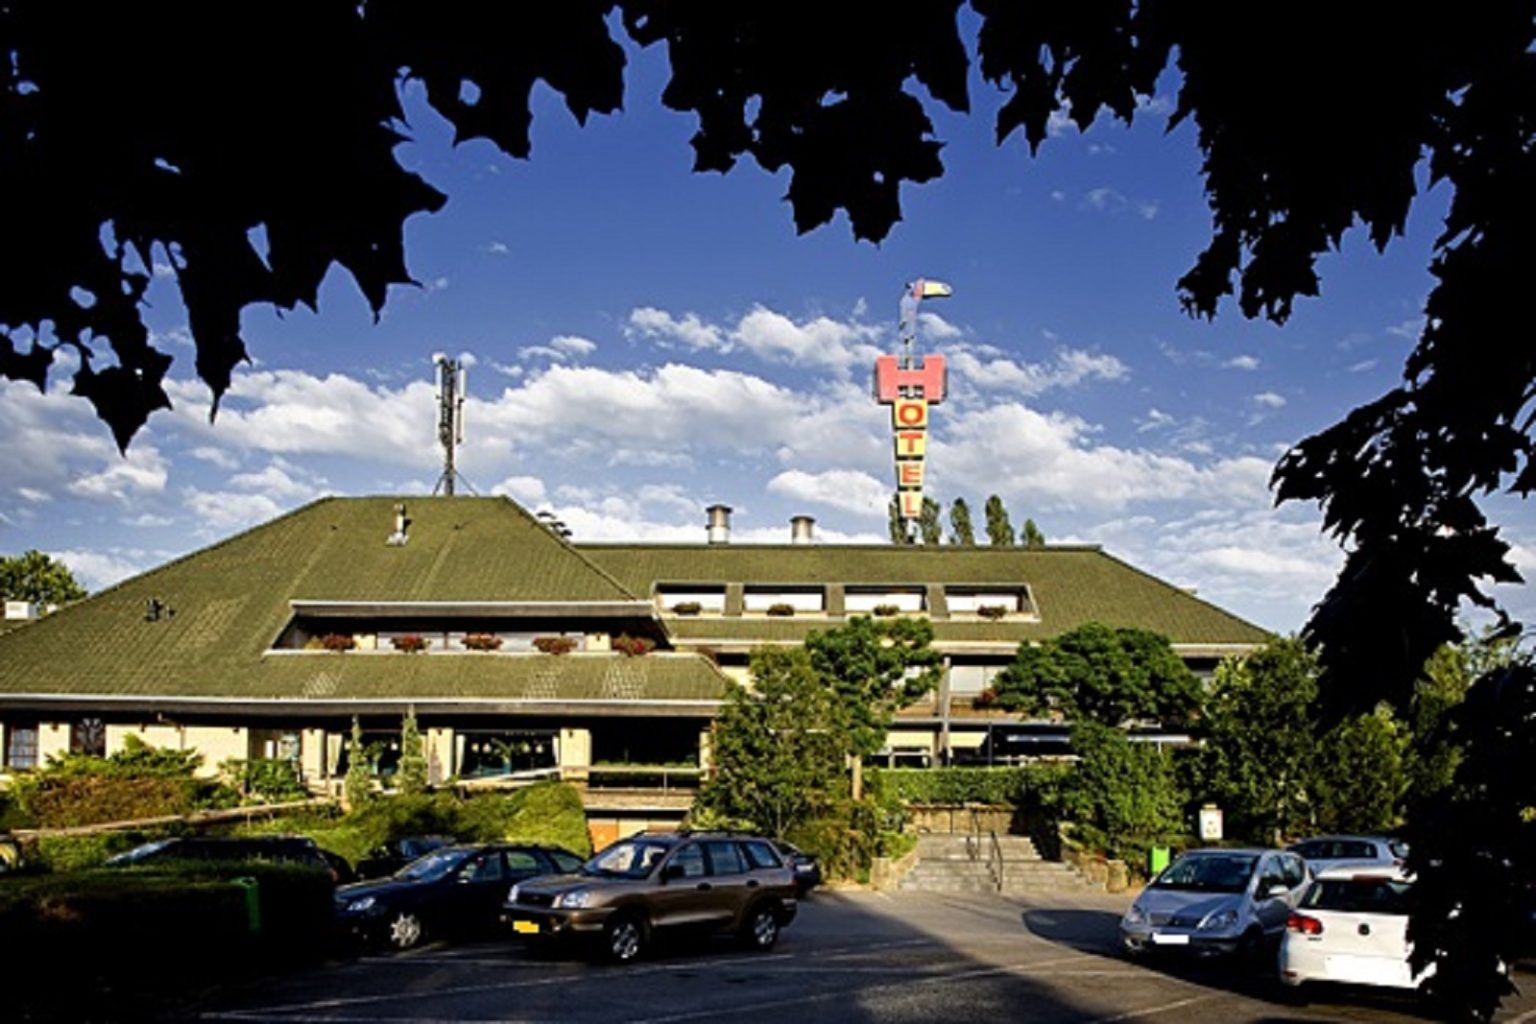 Van der Valk Hotel Moers